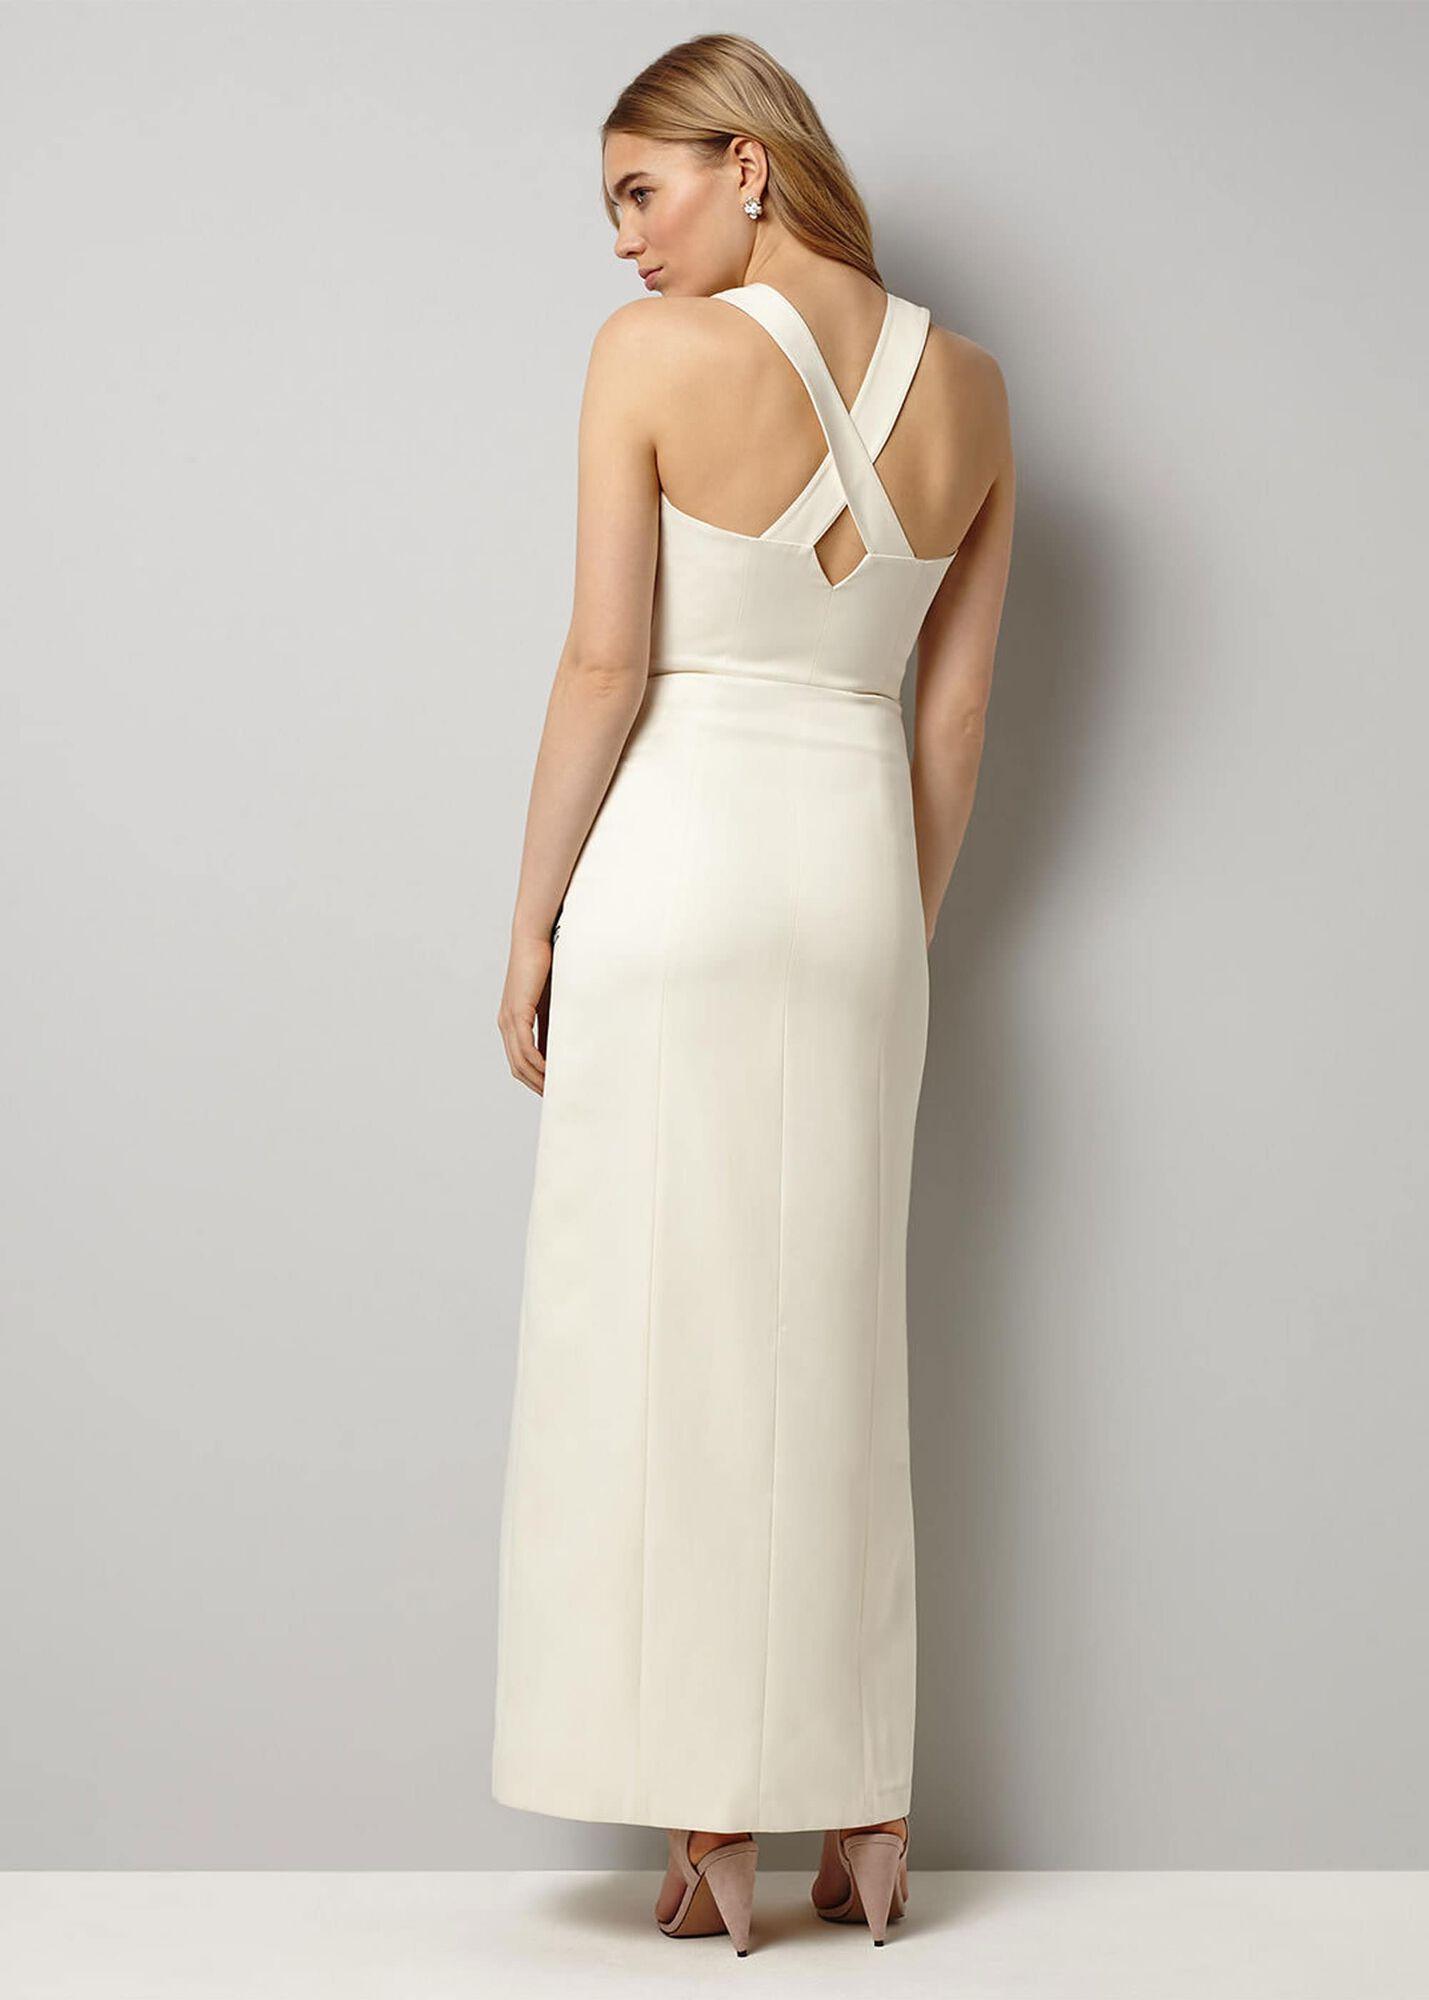 b795f7a2 Zarah Embroidered Maxi Dress. Previous Next